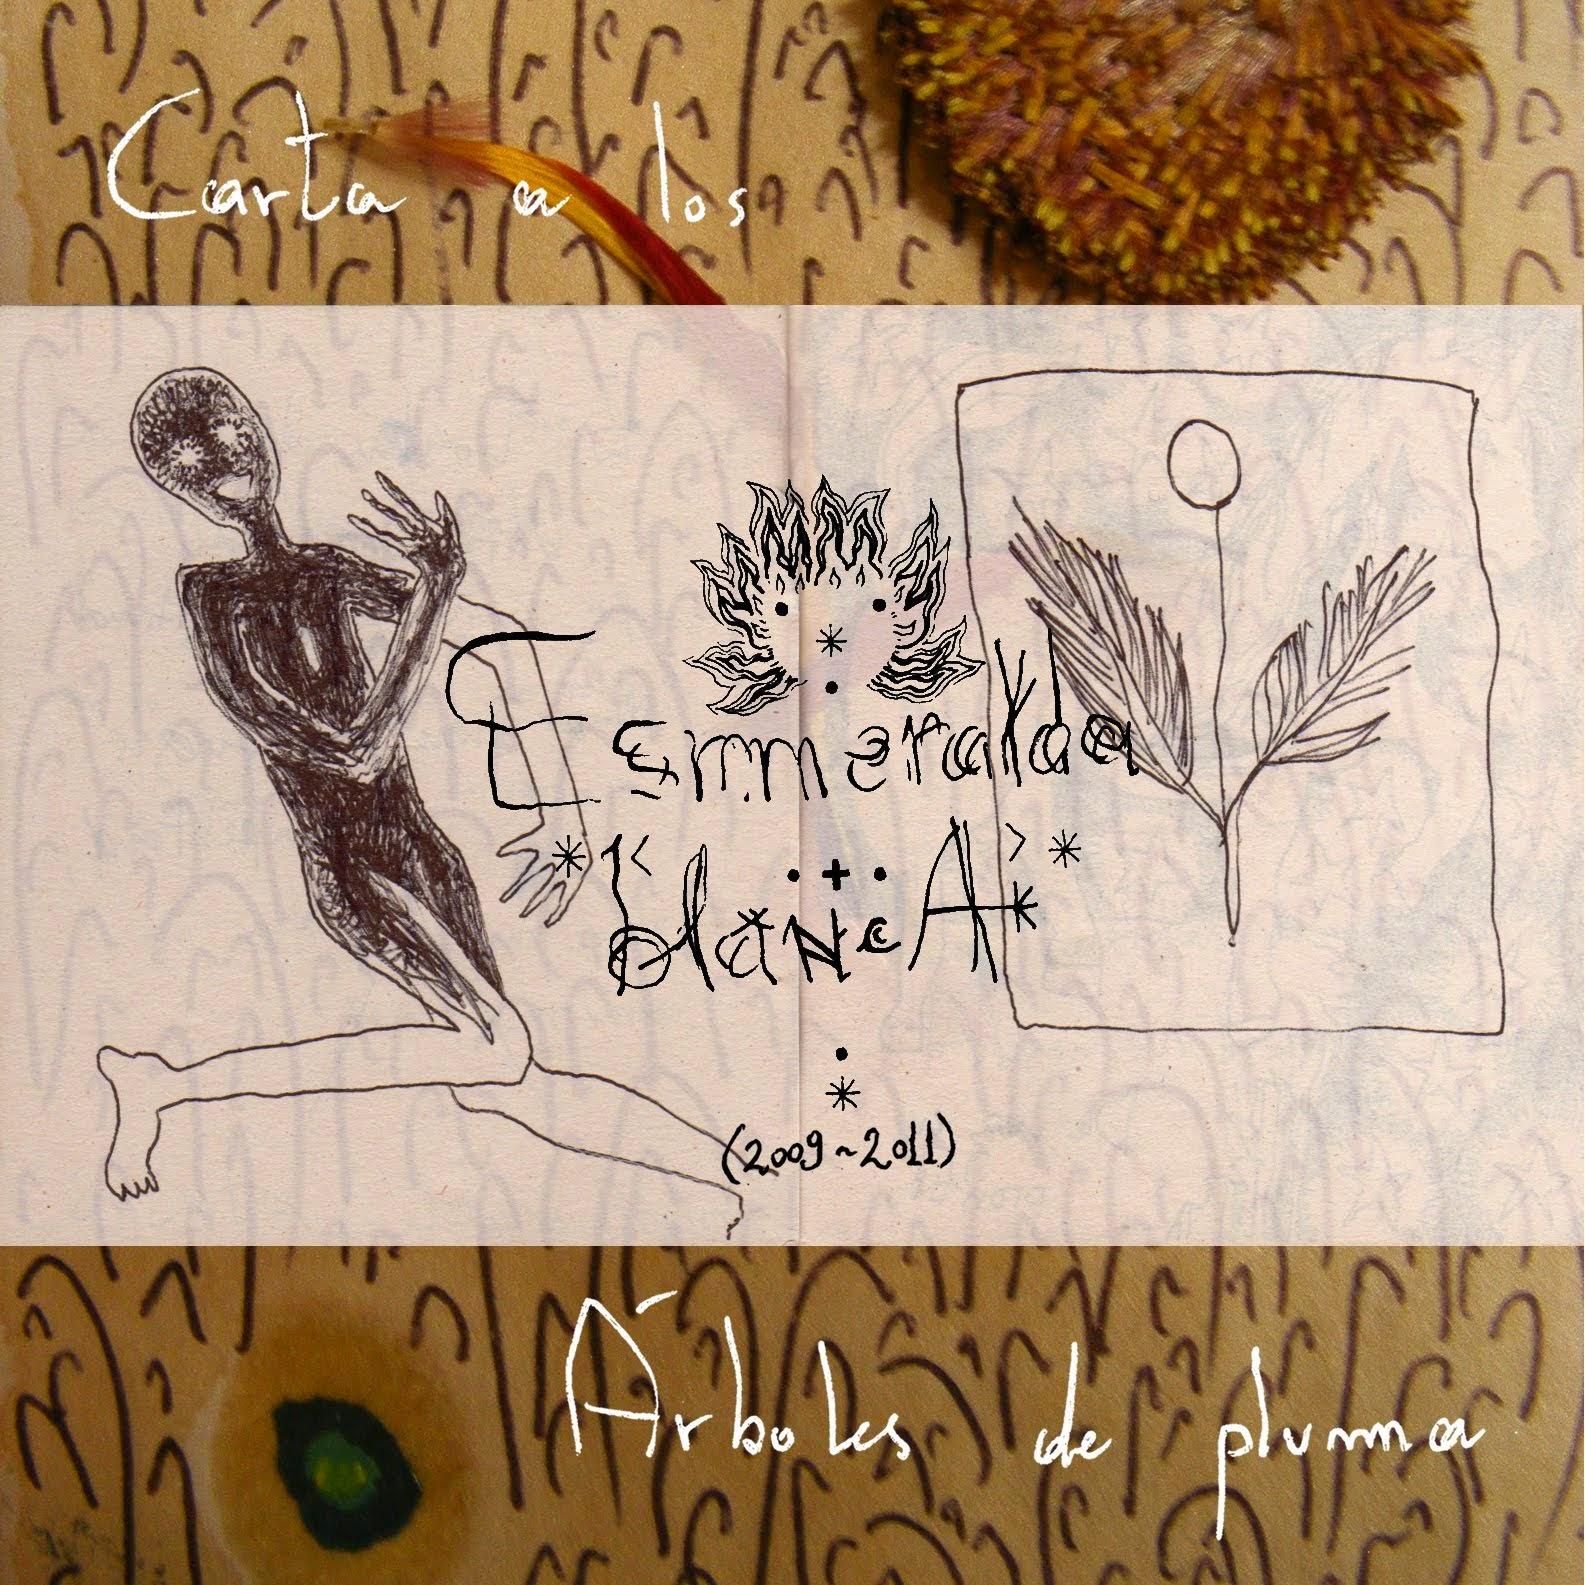 Carta a los Árboles de pluma (2009-2011)